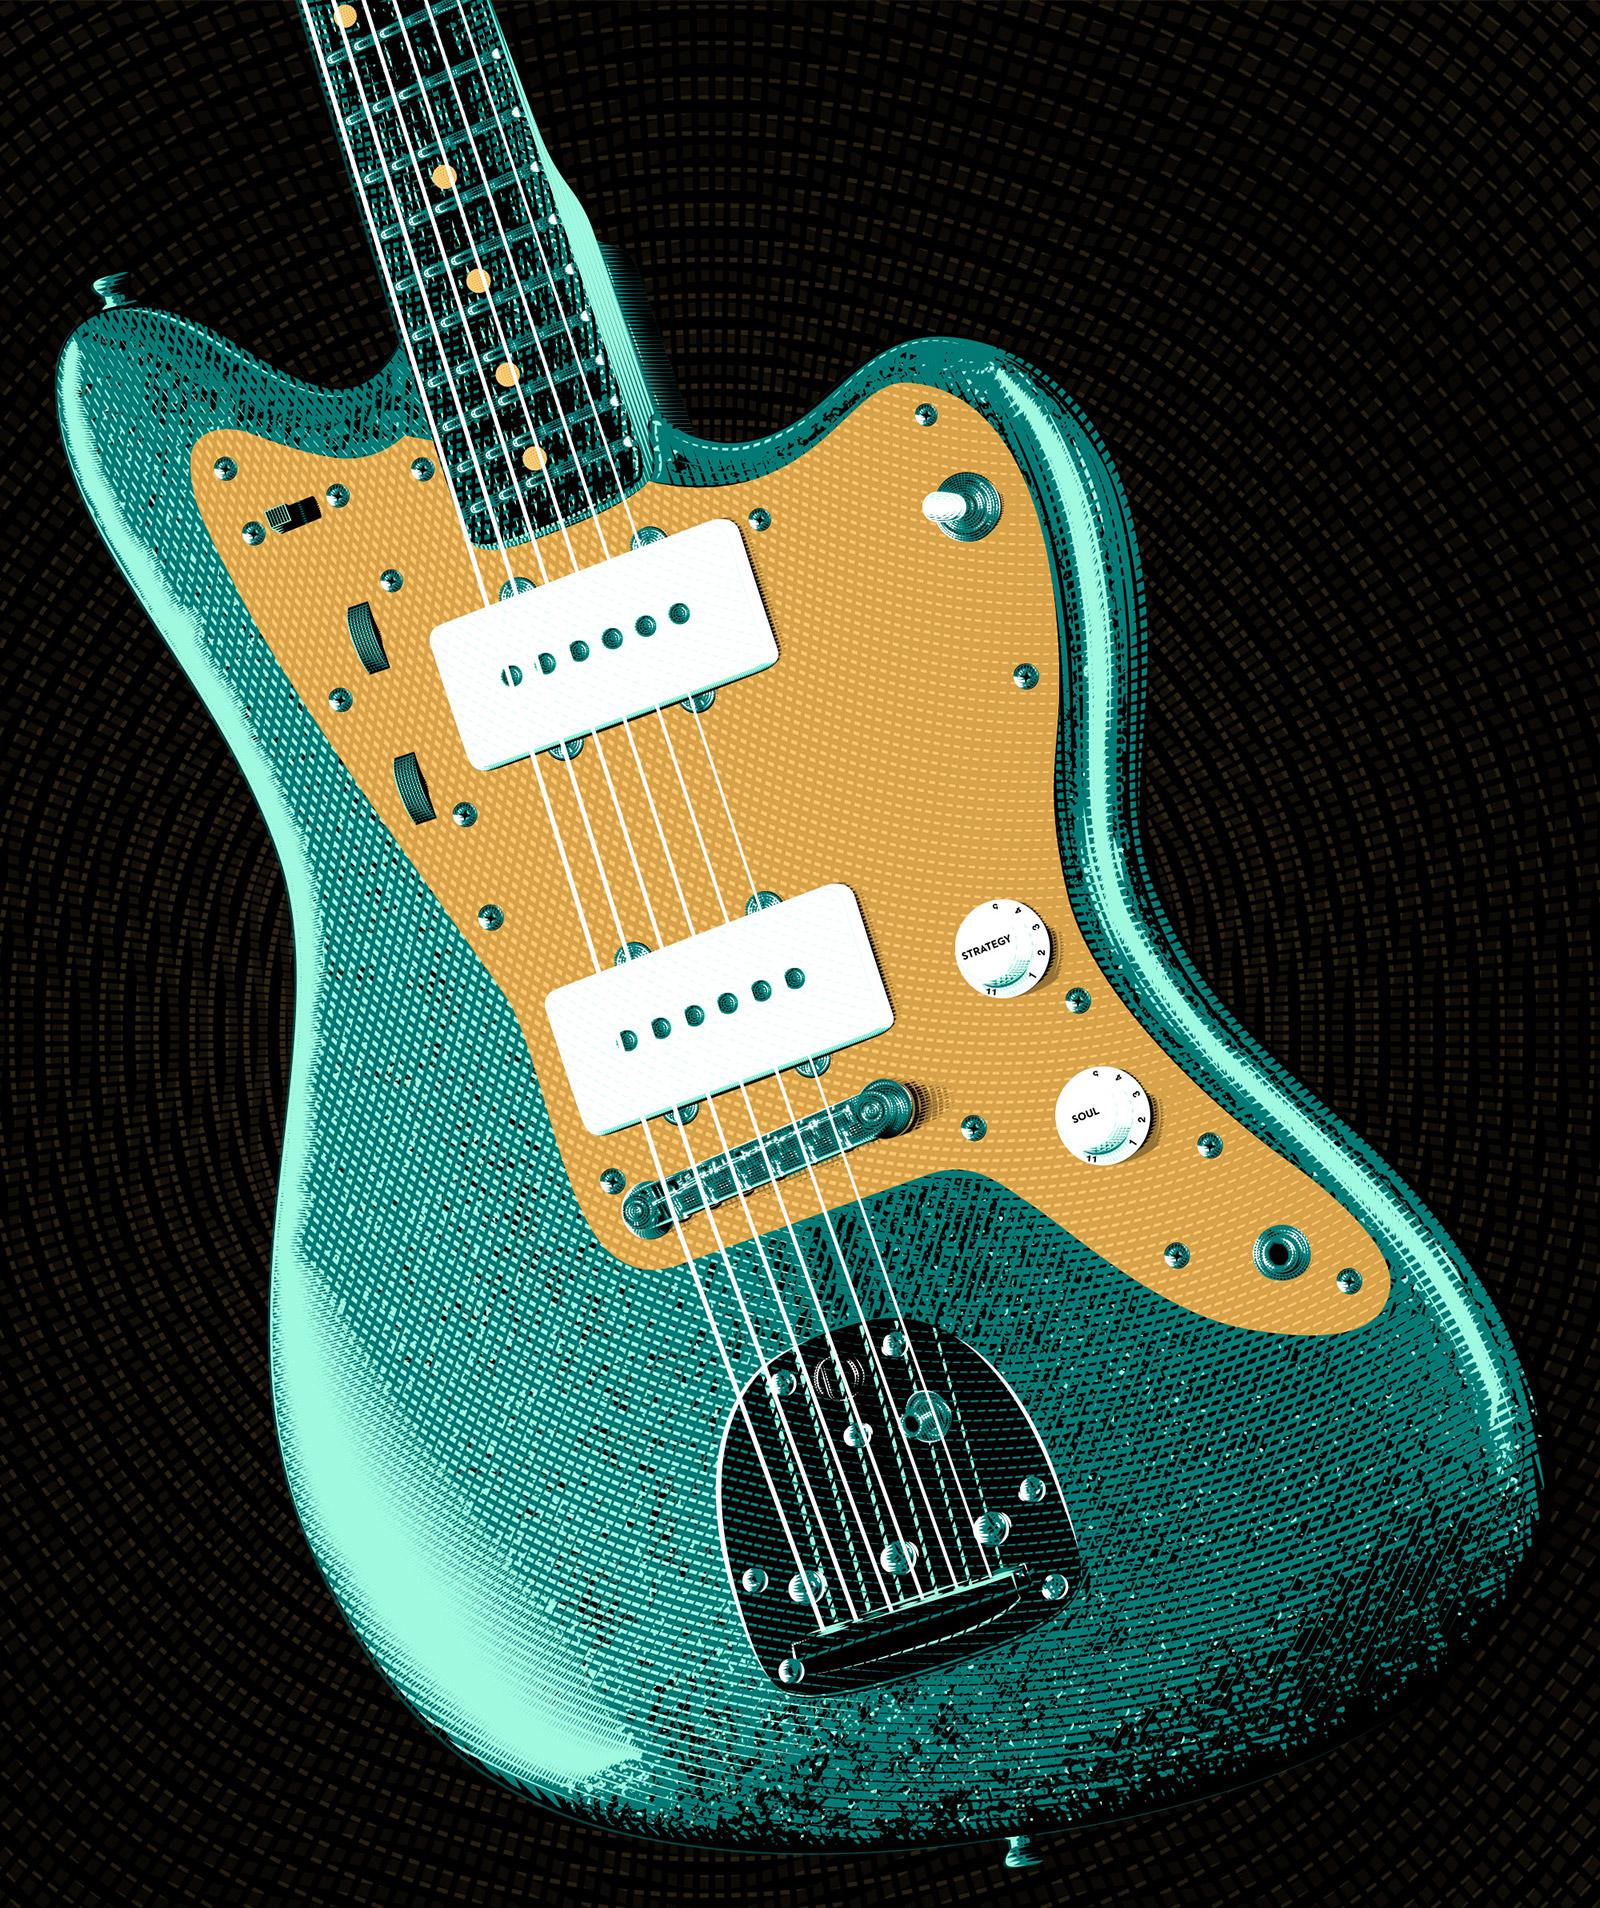 Gold Sheep Design Jazzmaster Guitar IIllustration Full